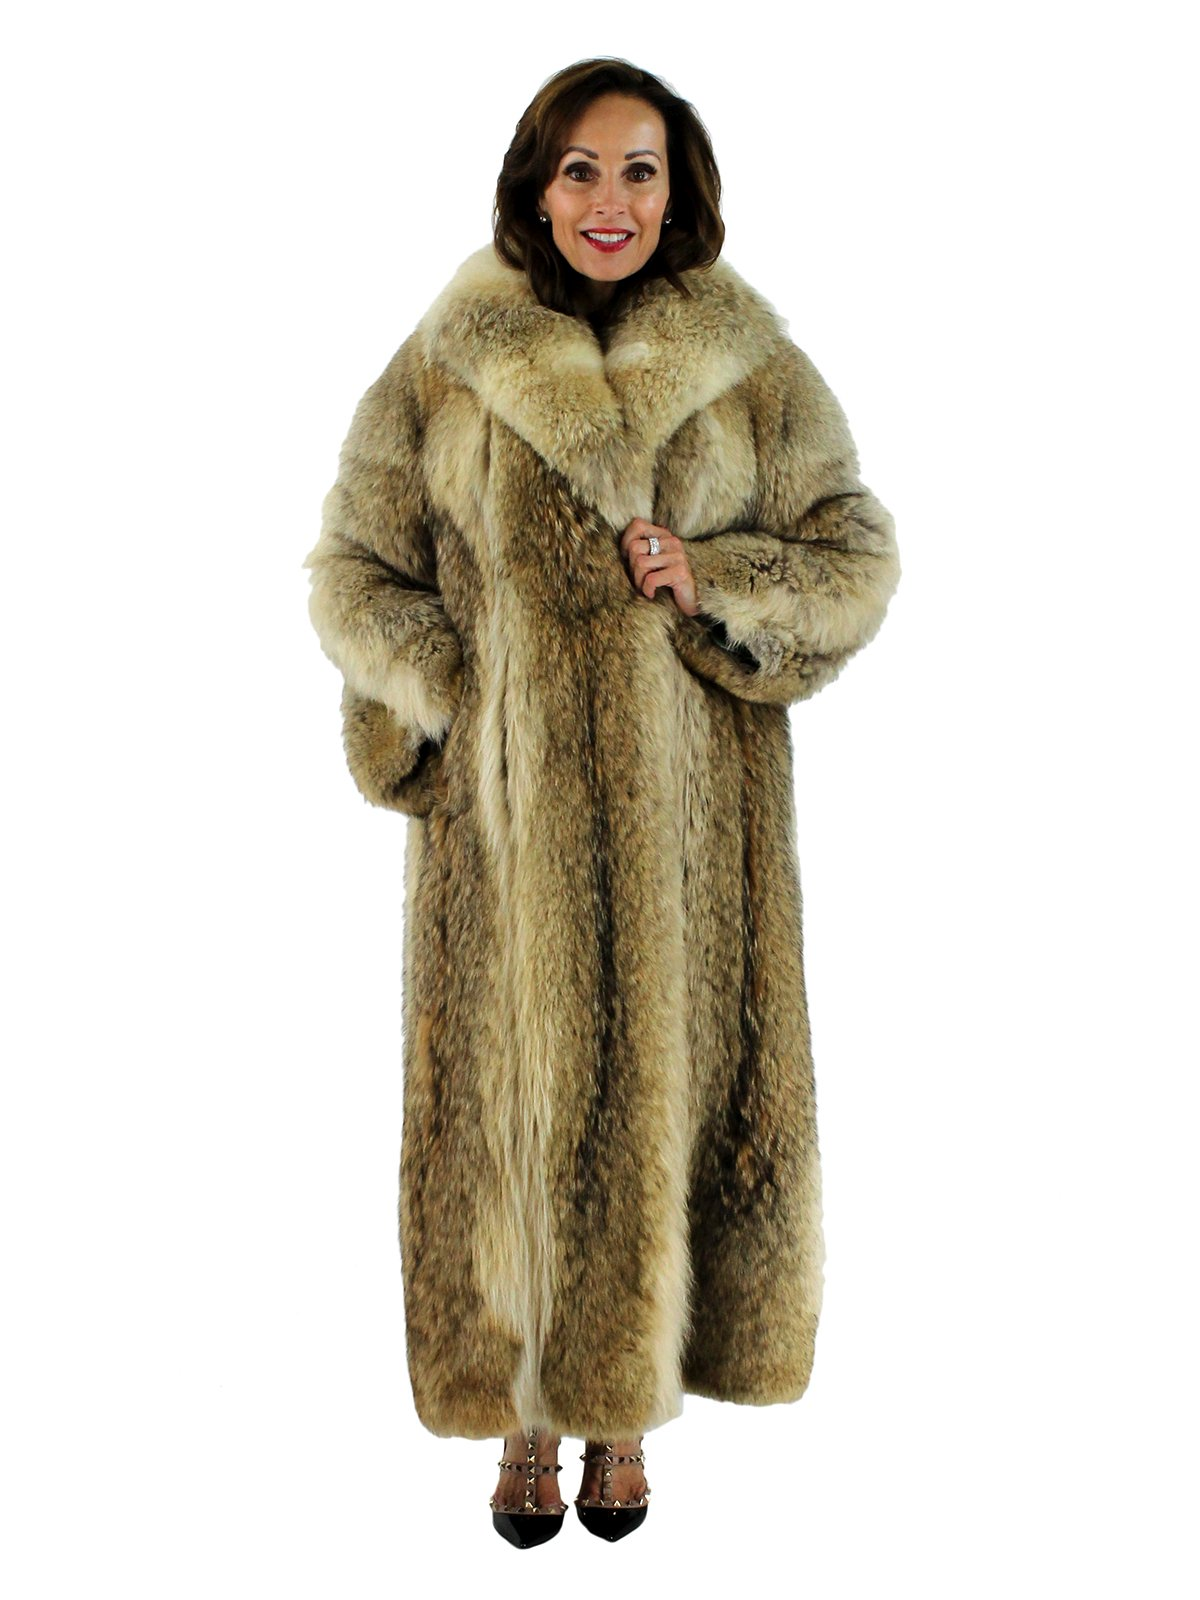 Coyote Fur Coat >> Natural Coyote Fur Coat Women S Medium Estate Furs